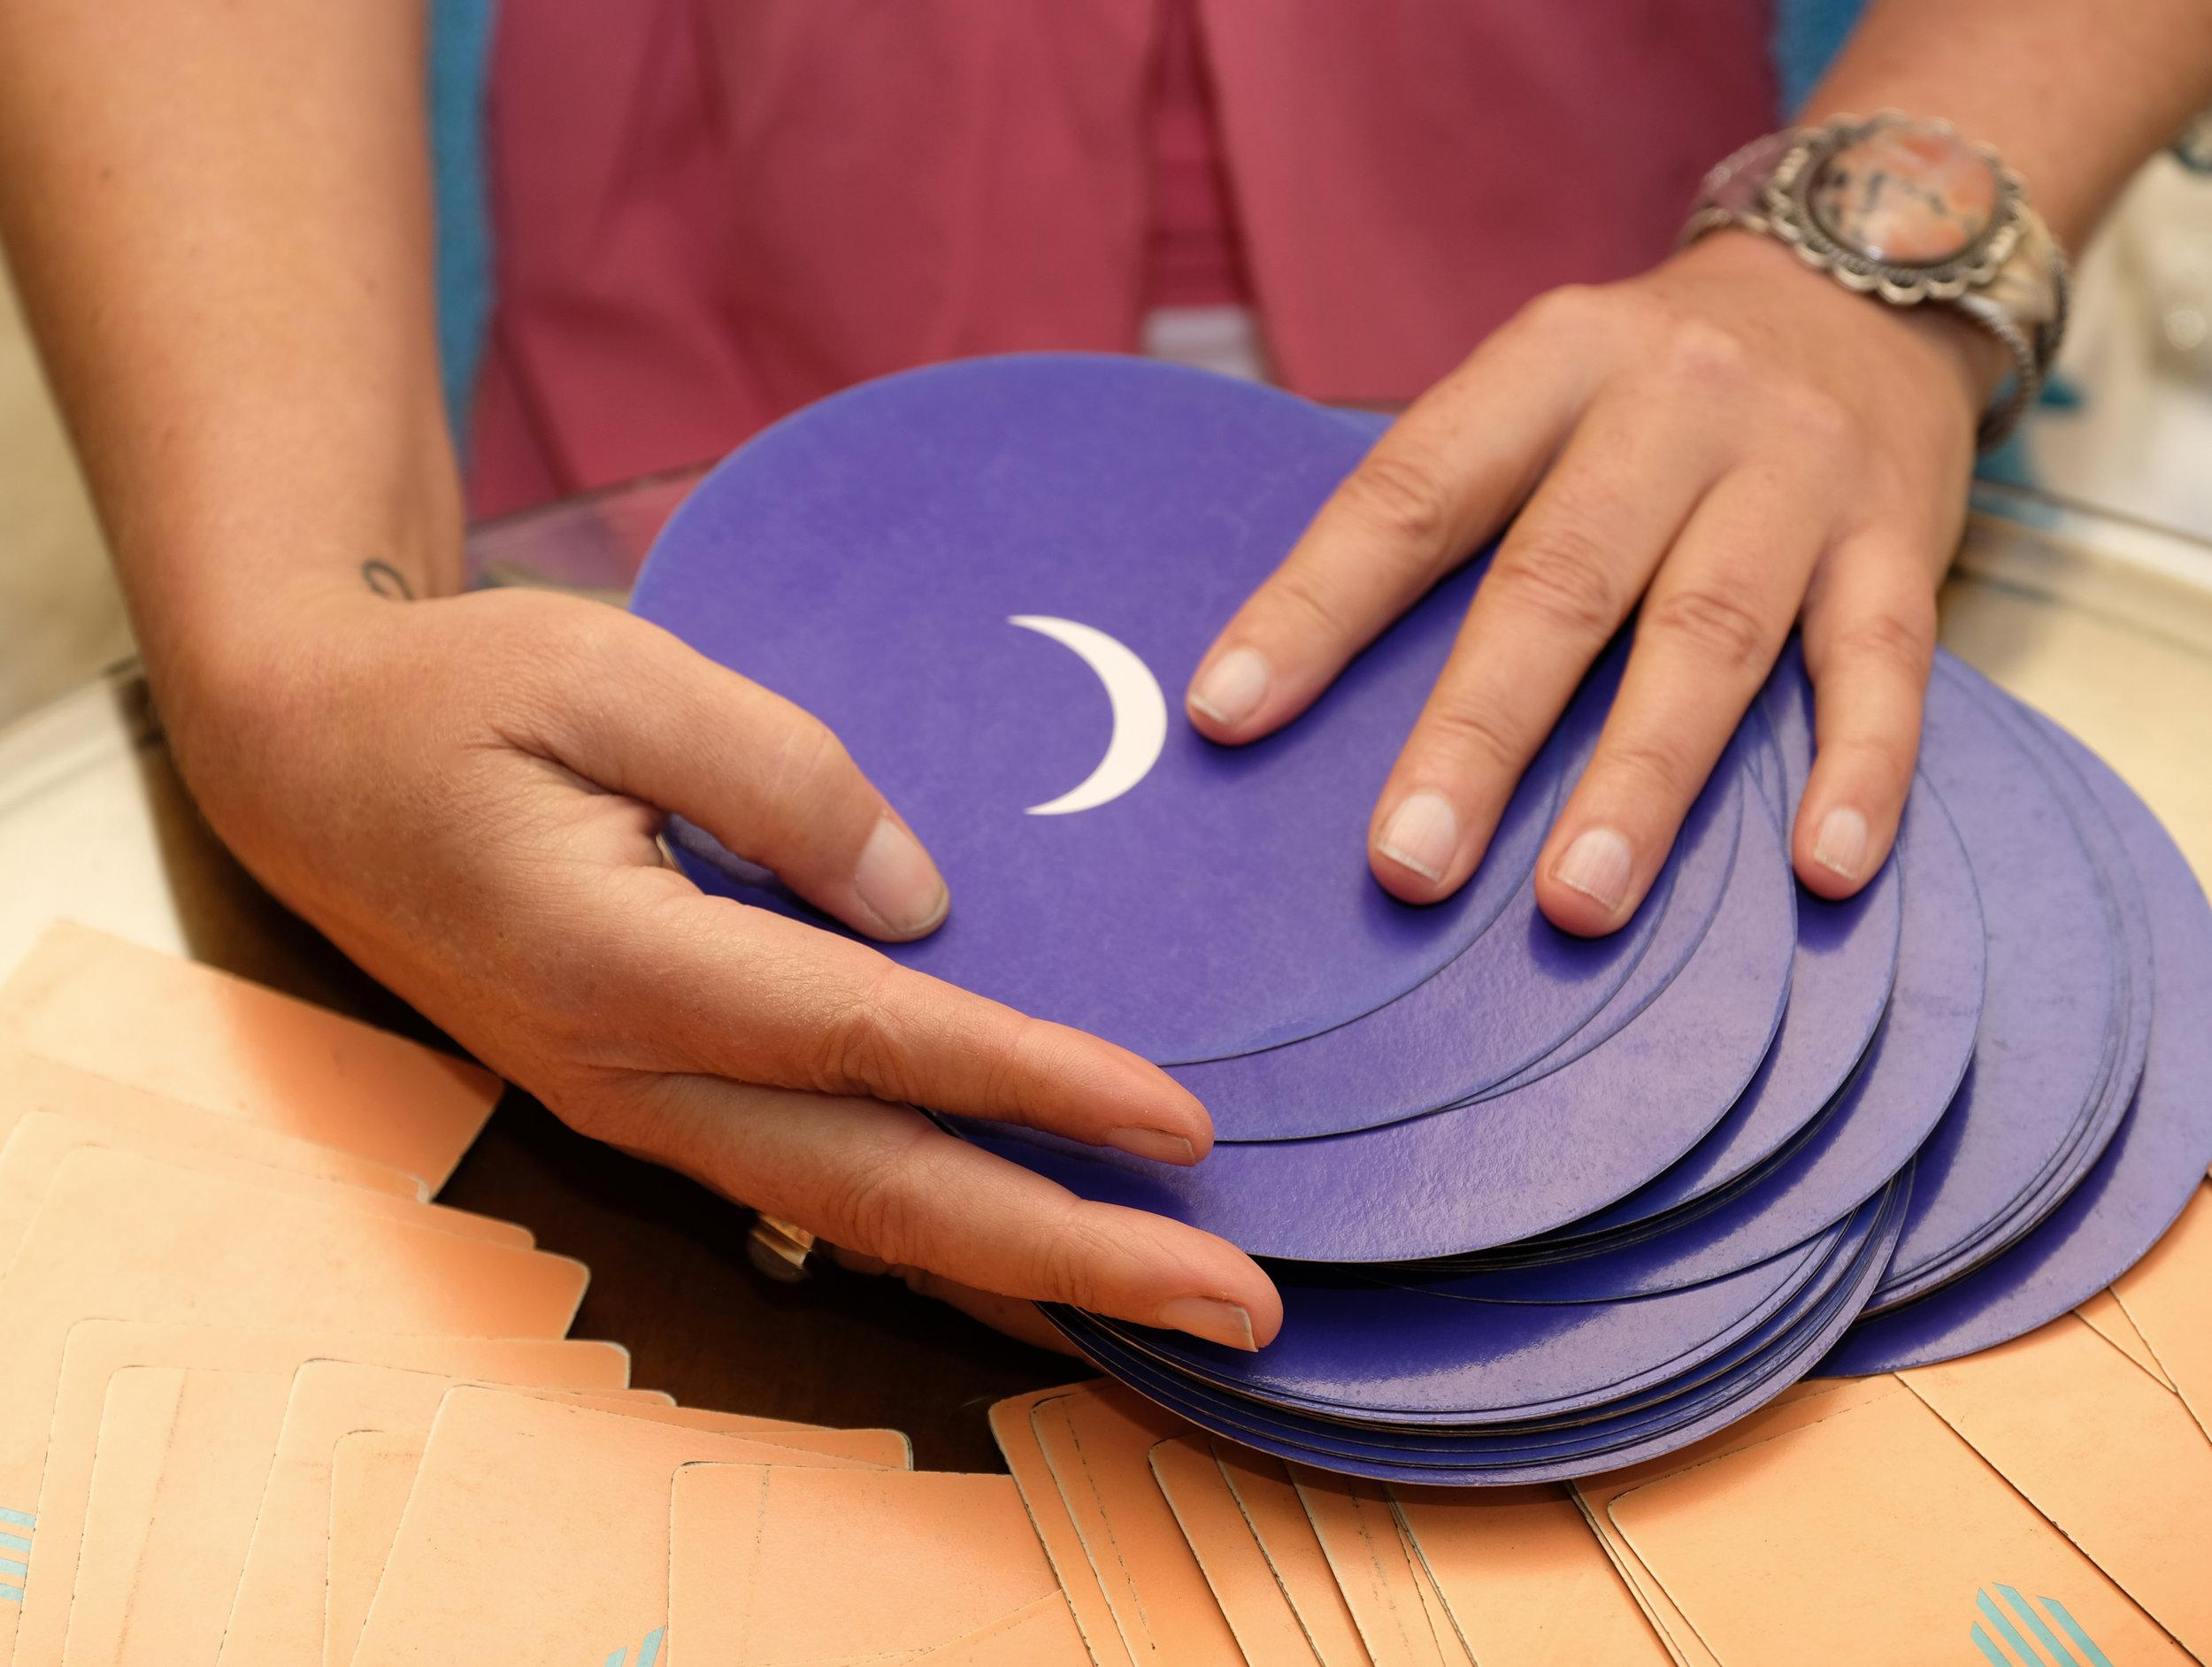 psychic Tarot card reading by Danai of Moonflower Medicine